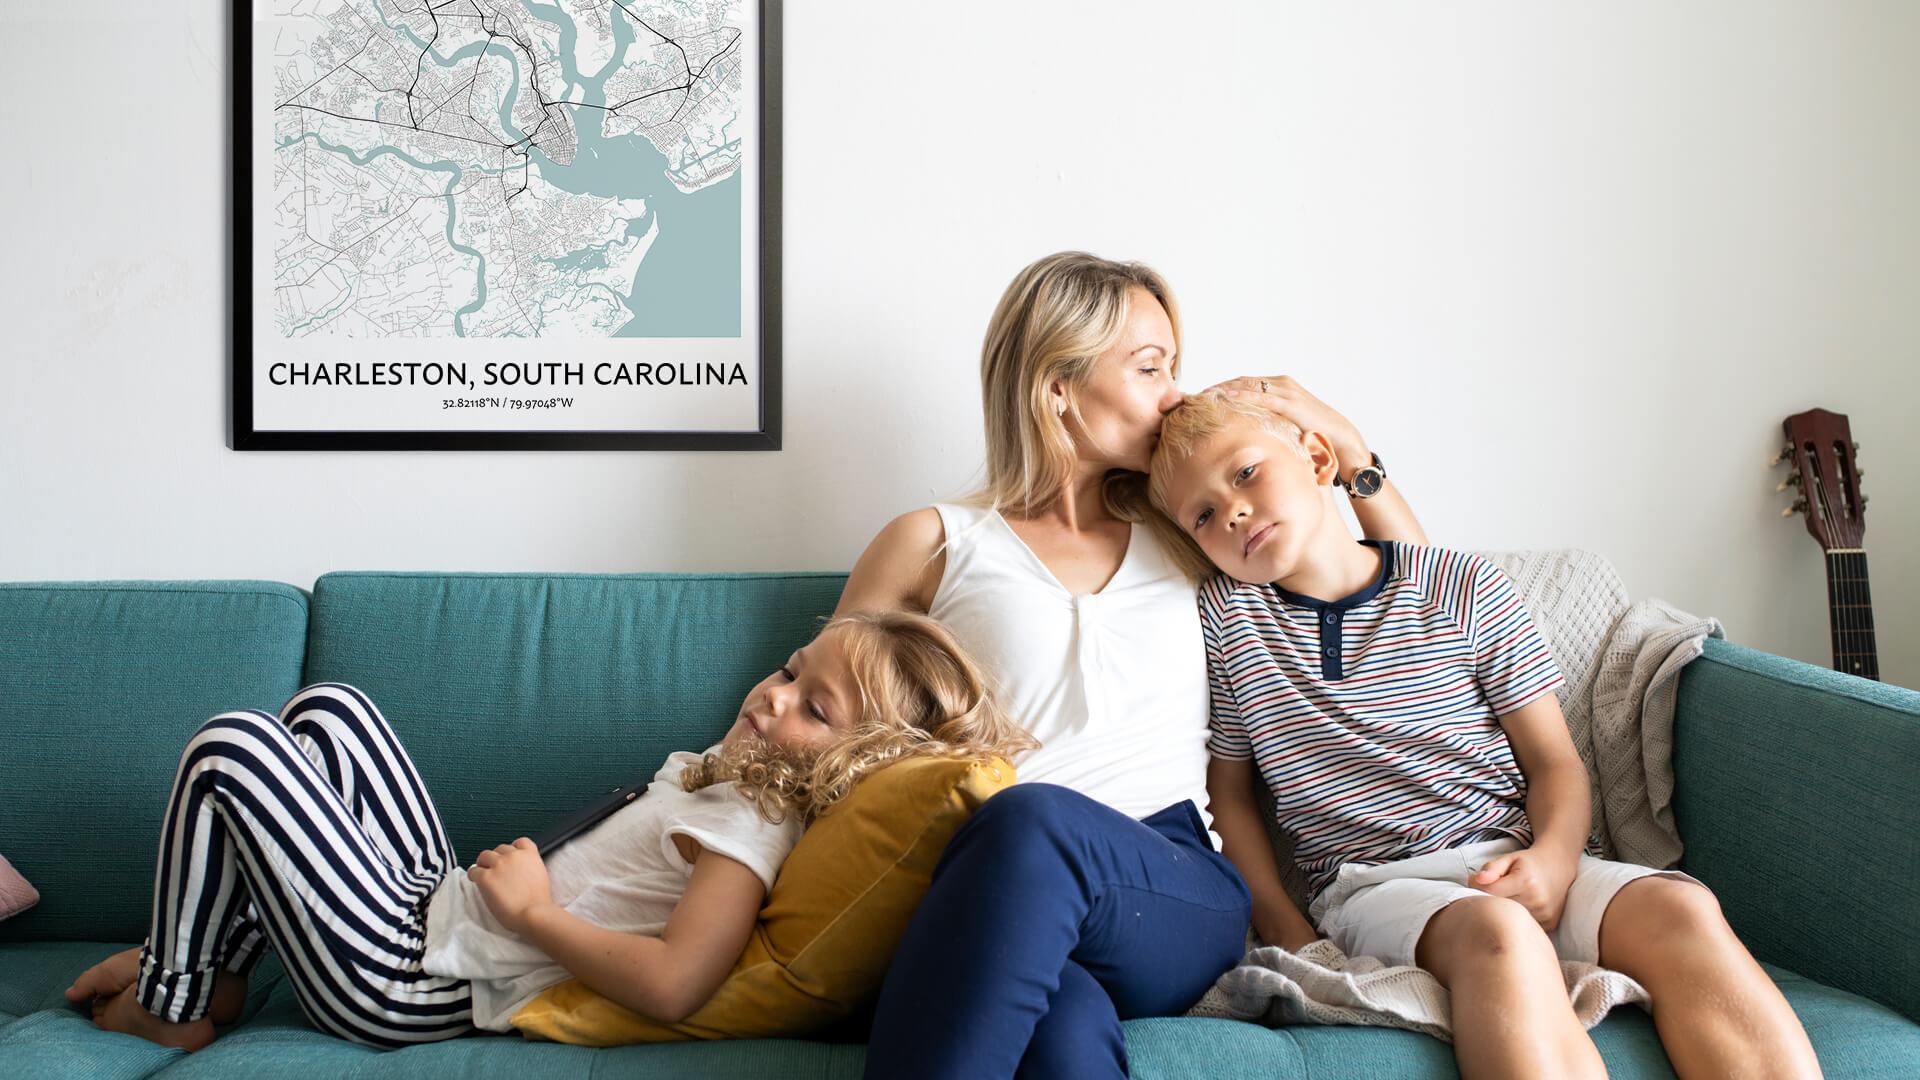 Charleston South Carolina map poster